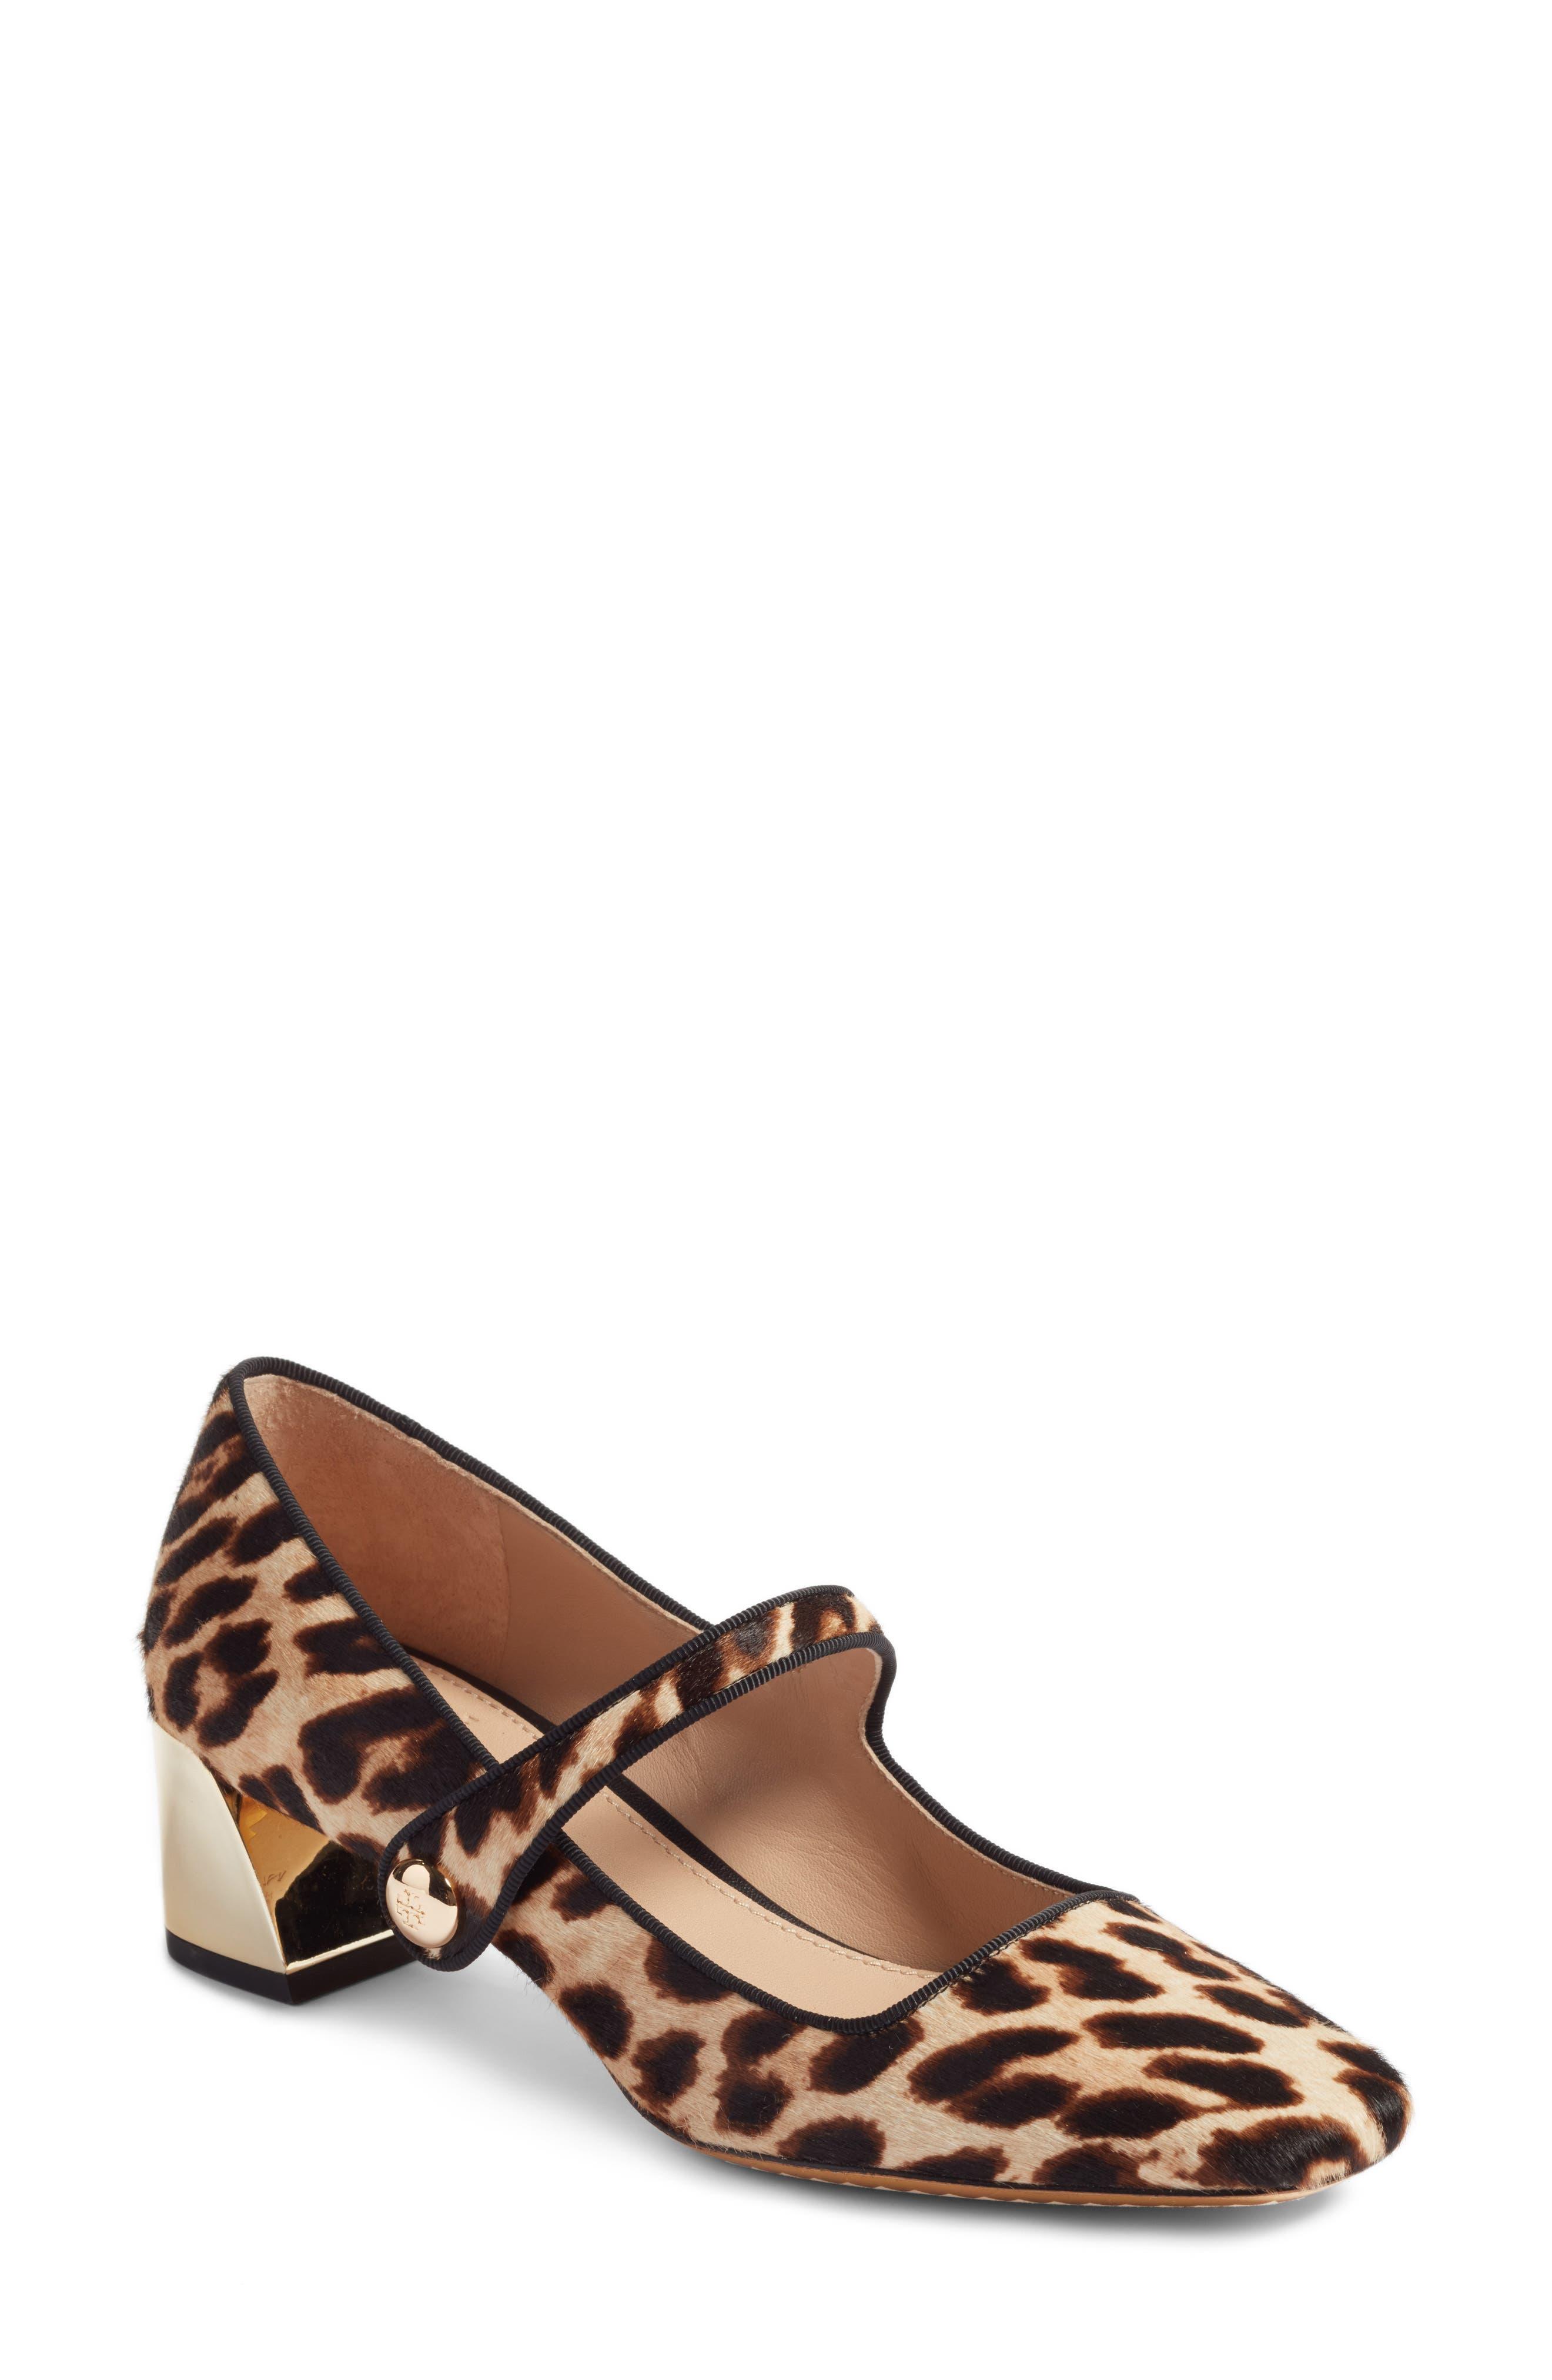 Marisa Genuine Calf Hair Mary Jane Pump,                             Main thumbnail 1, color,                             Natural Leopard/ Black